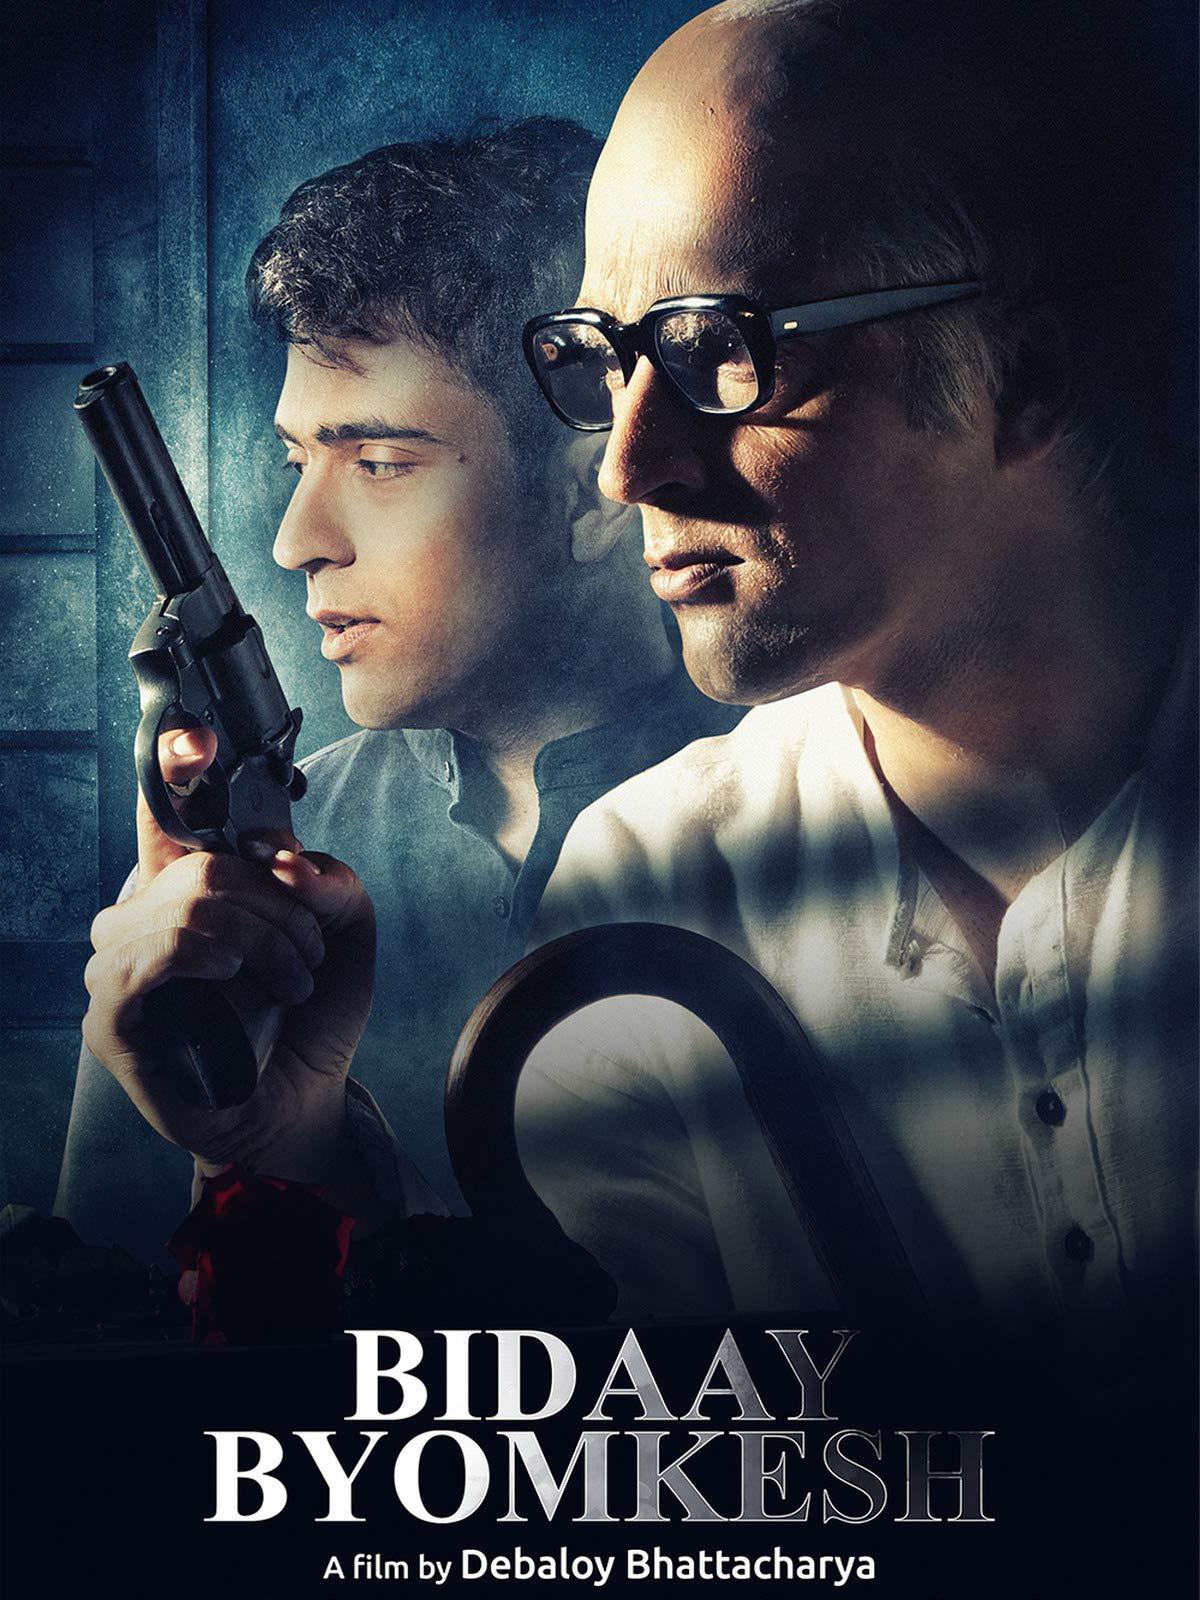 Bidaay Byomkesh